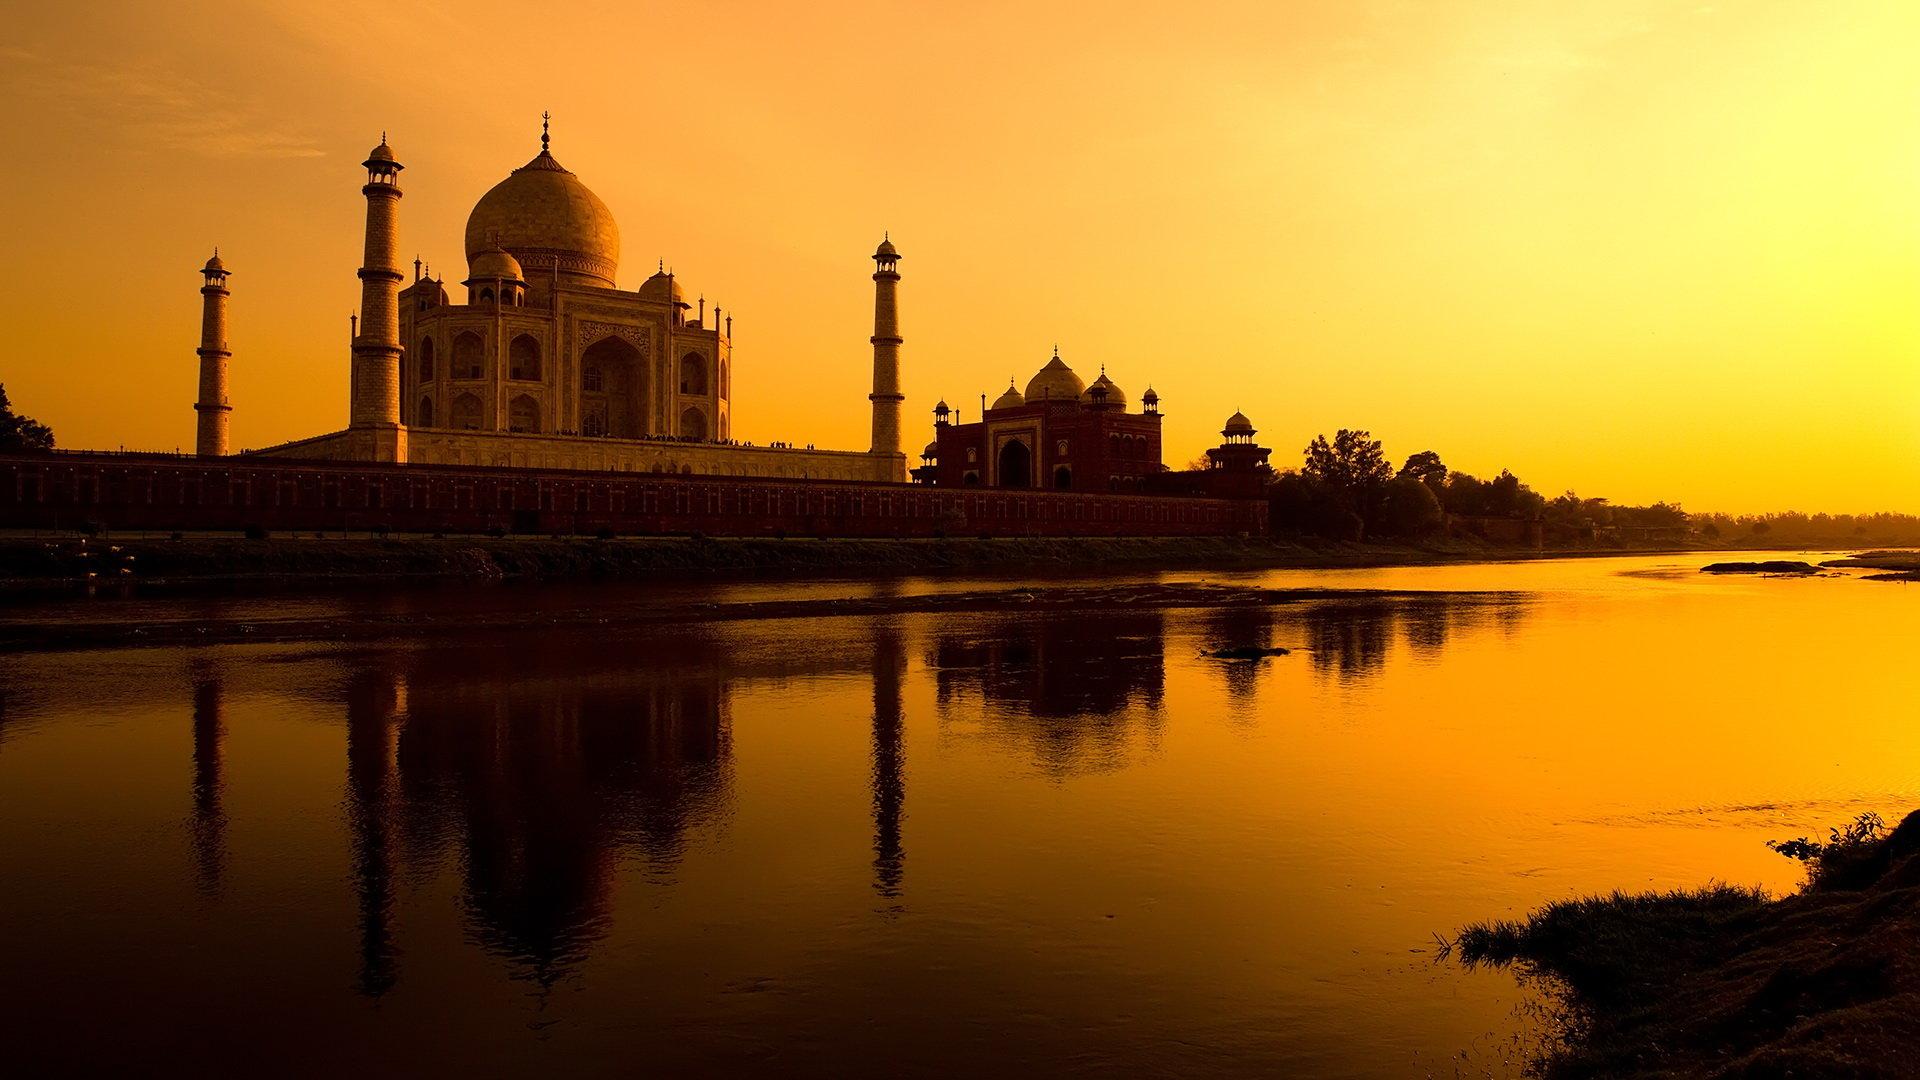 Taj Mahal Wallpapers Hd For Desktop Backgrounds